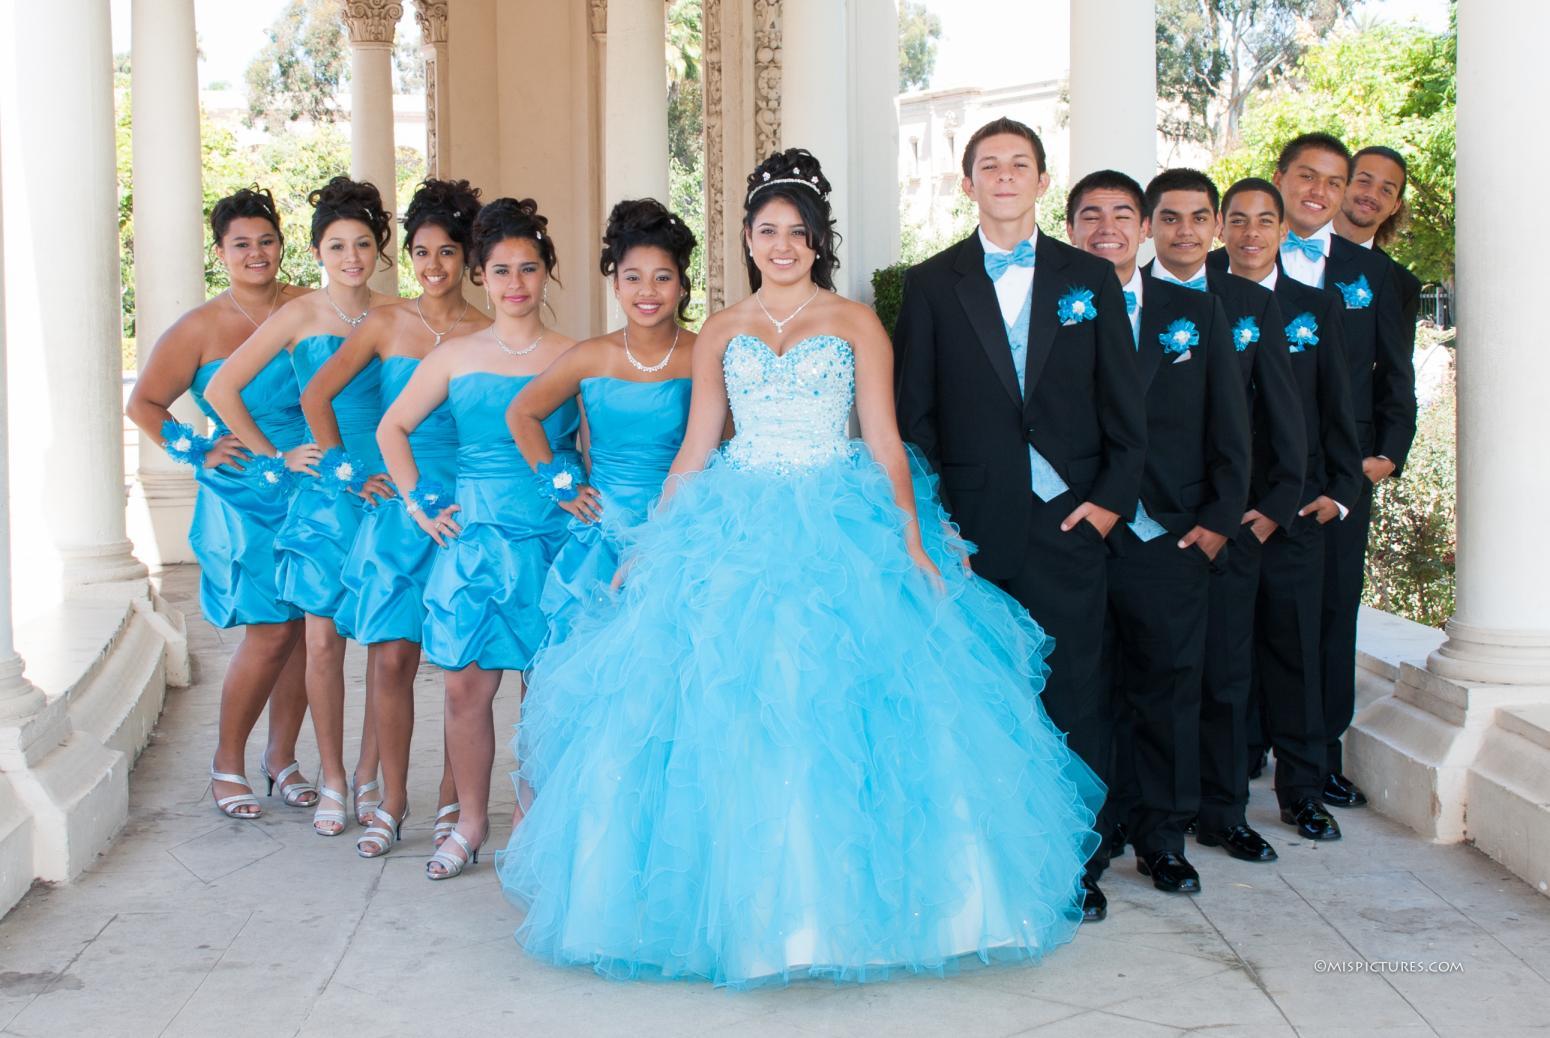 wedding dresses in mesa az photo - 1